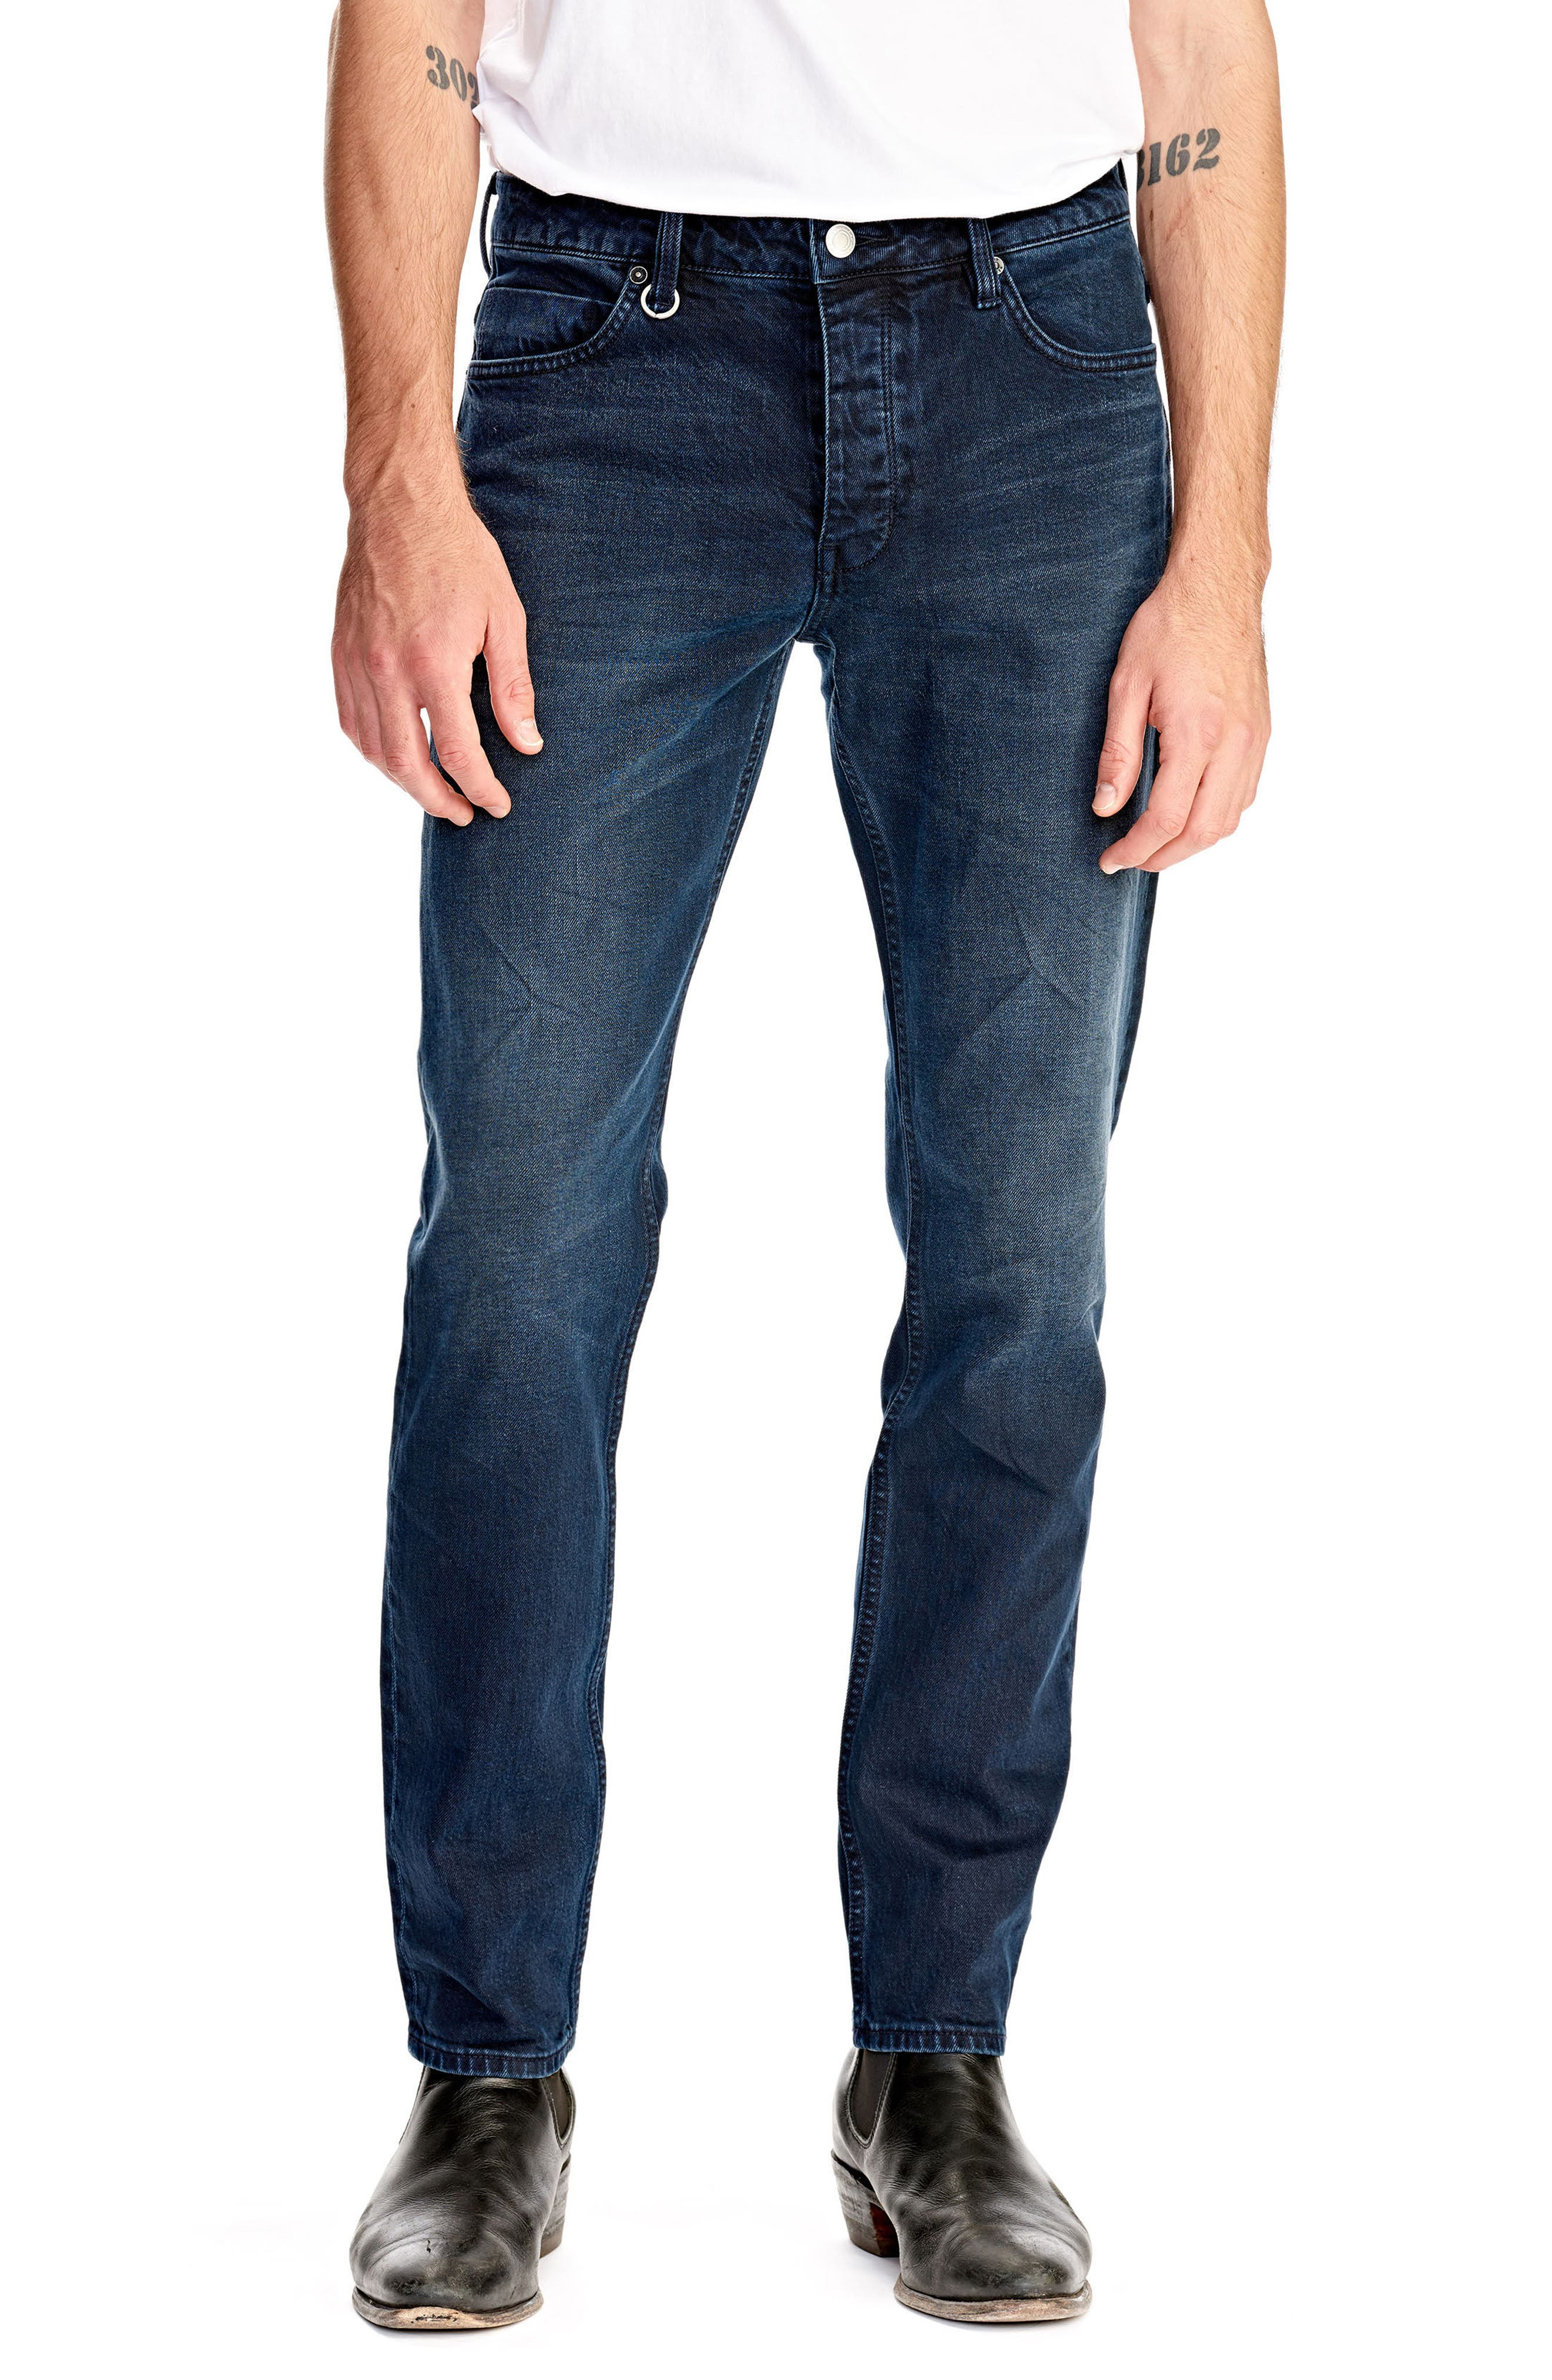 Lou Slim Fit Jeans,                         Main,                         color, Zydeco